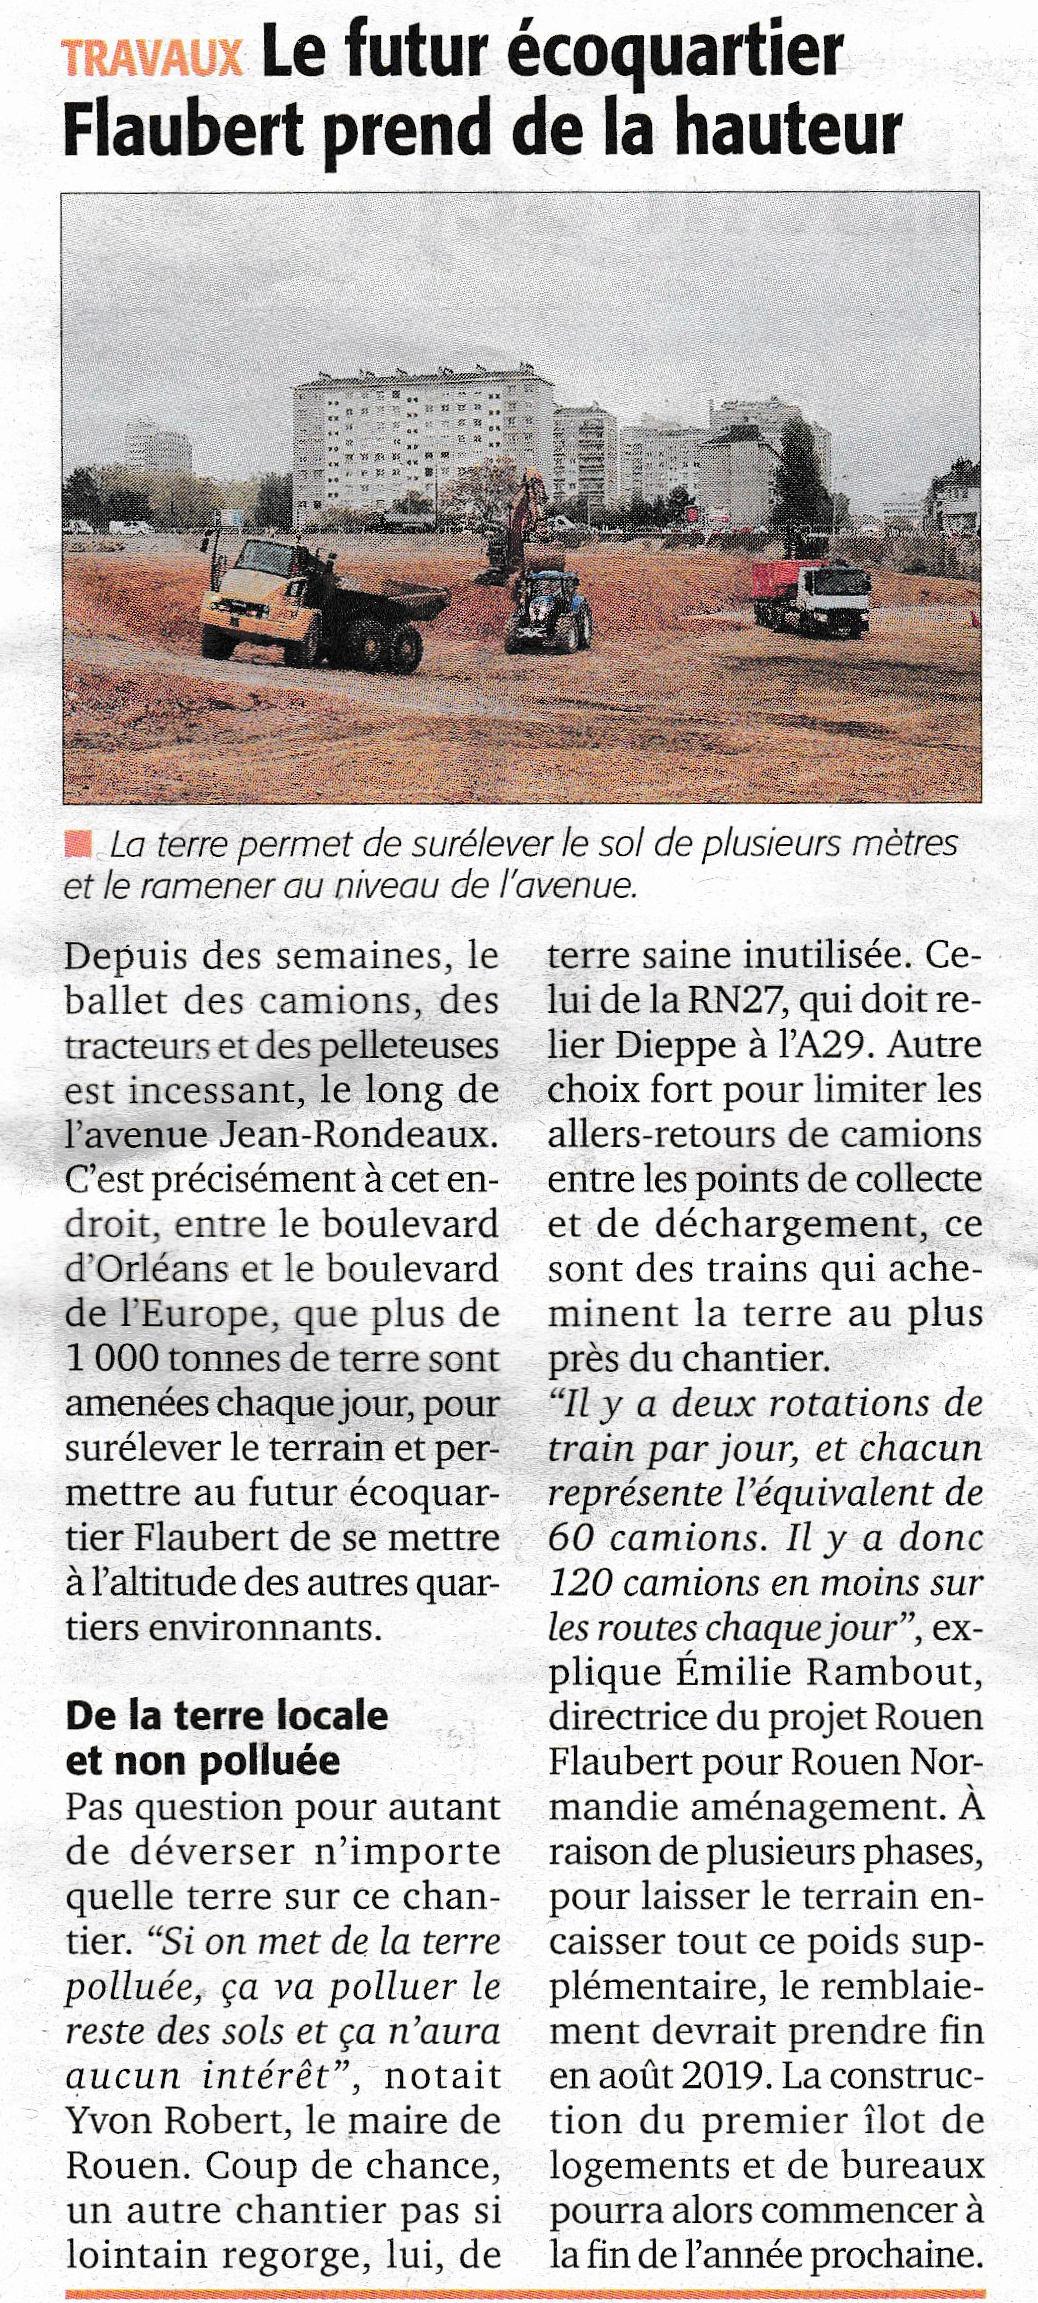 [Bientôt visible sur Google Earth] - Rouen - Ecoquartier Flaubert Flaube11